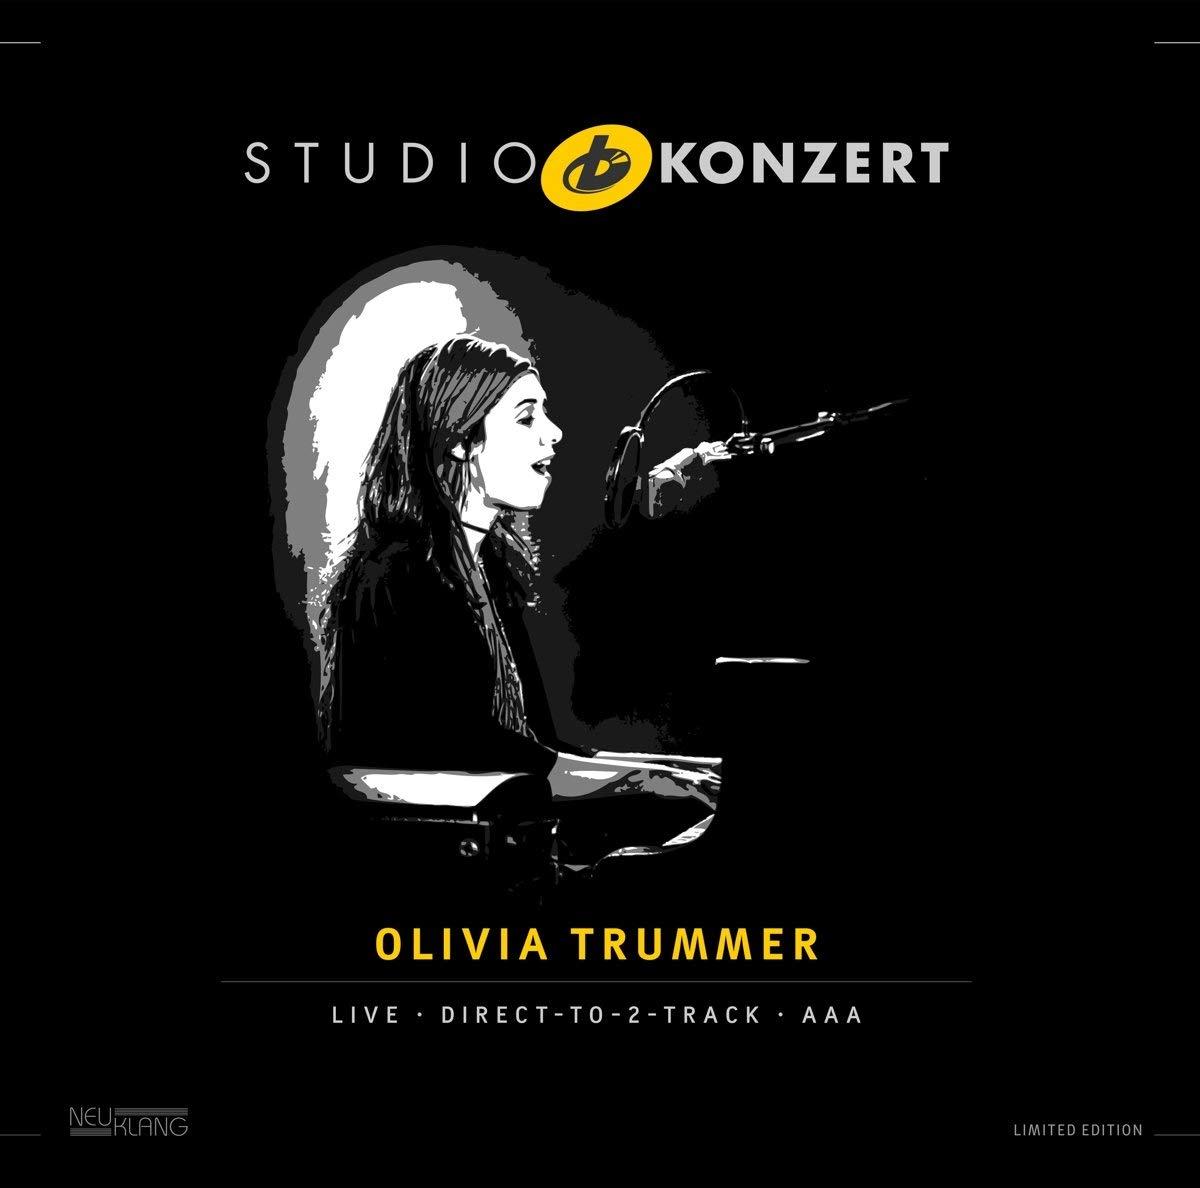 OLIVIA TRUMMER - Studio Konzert cover